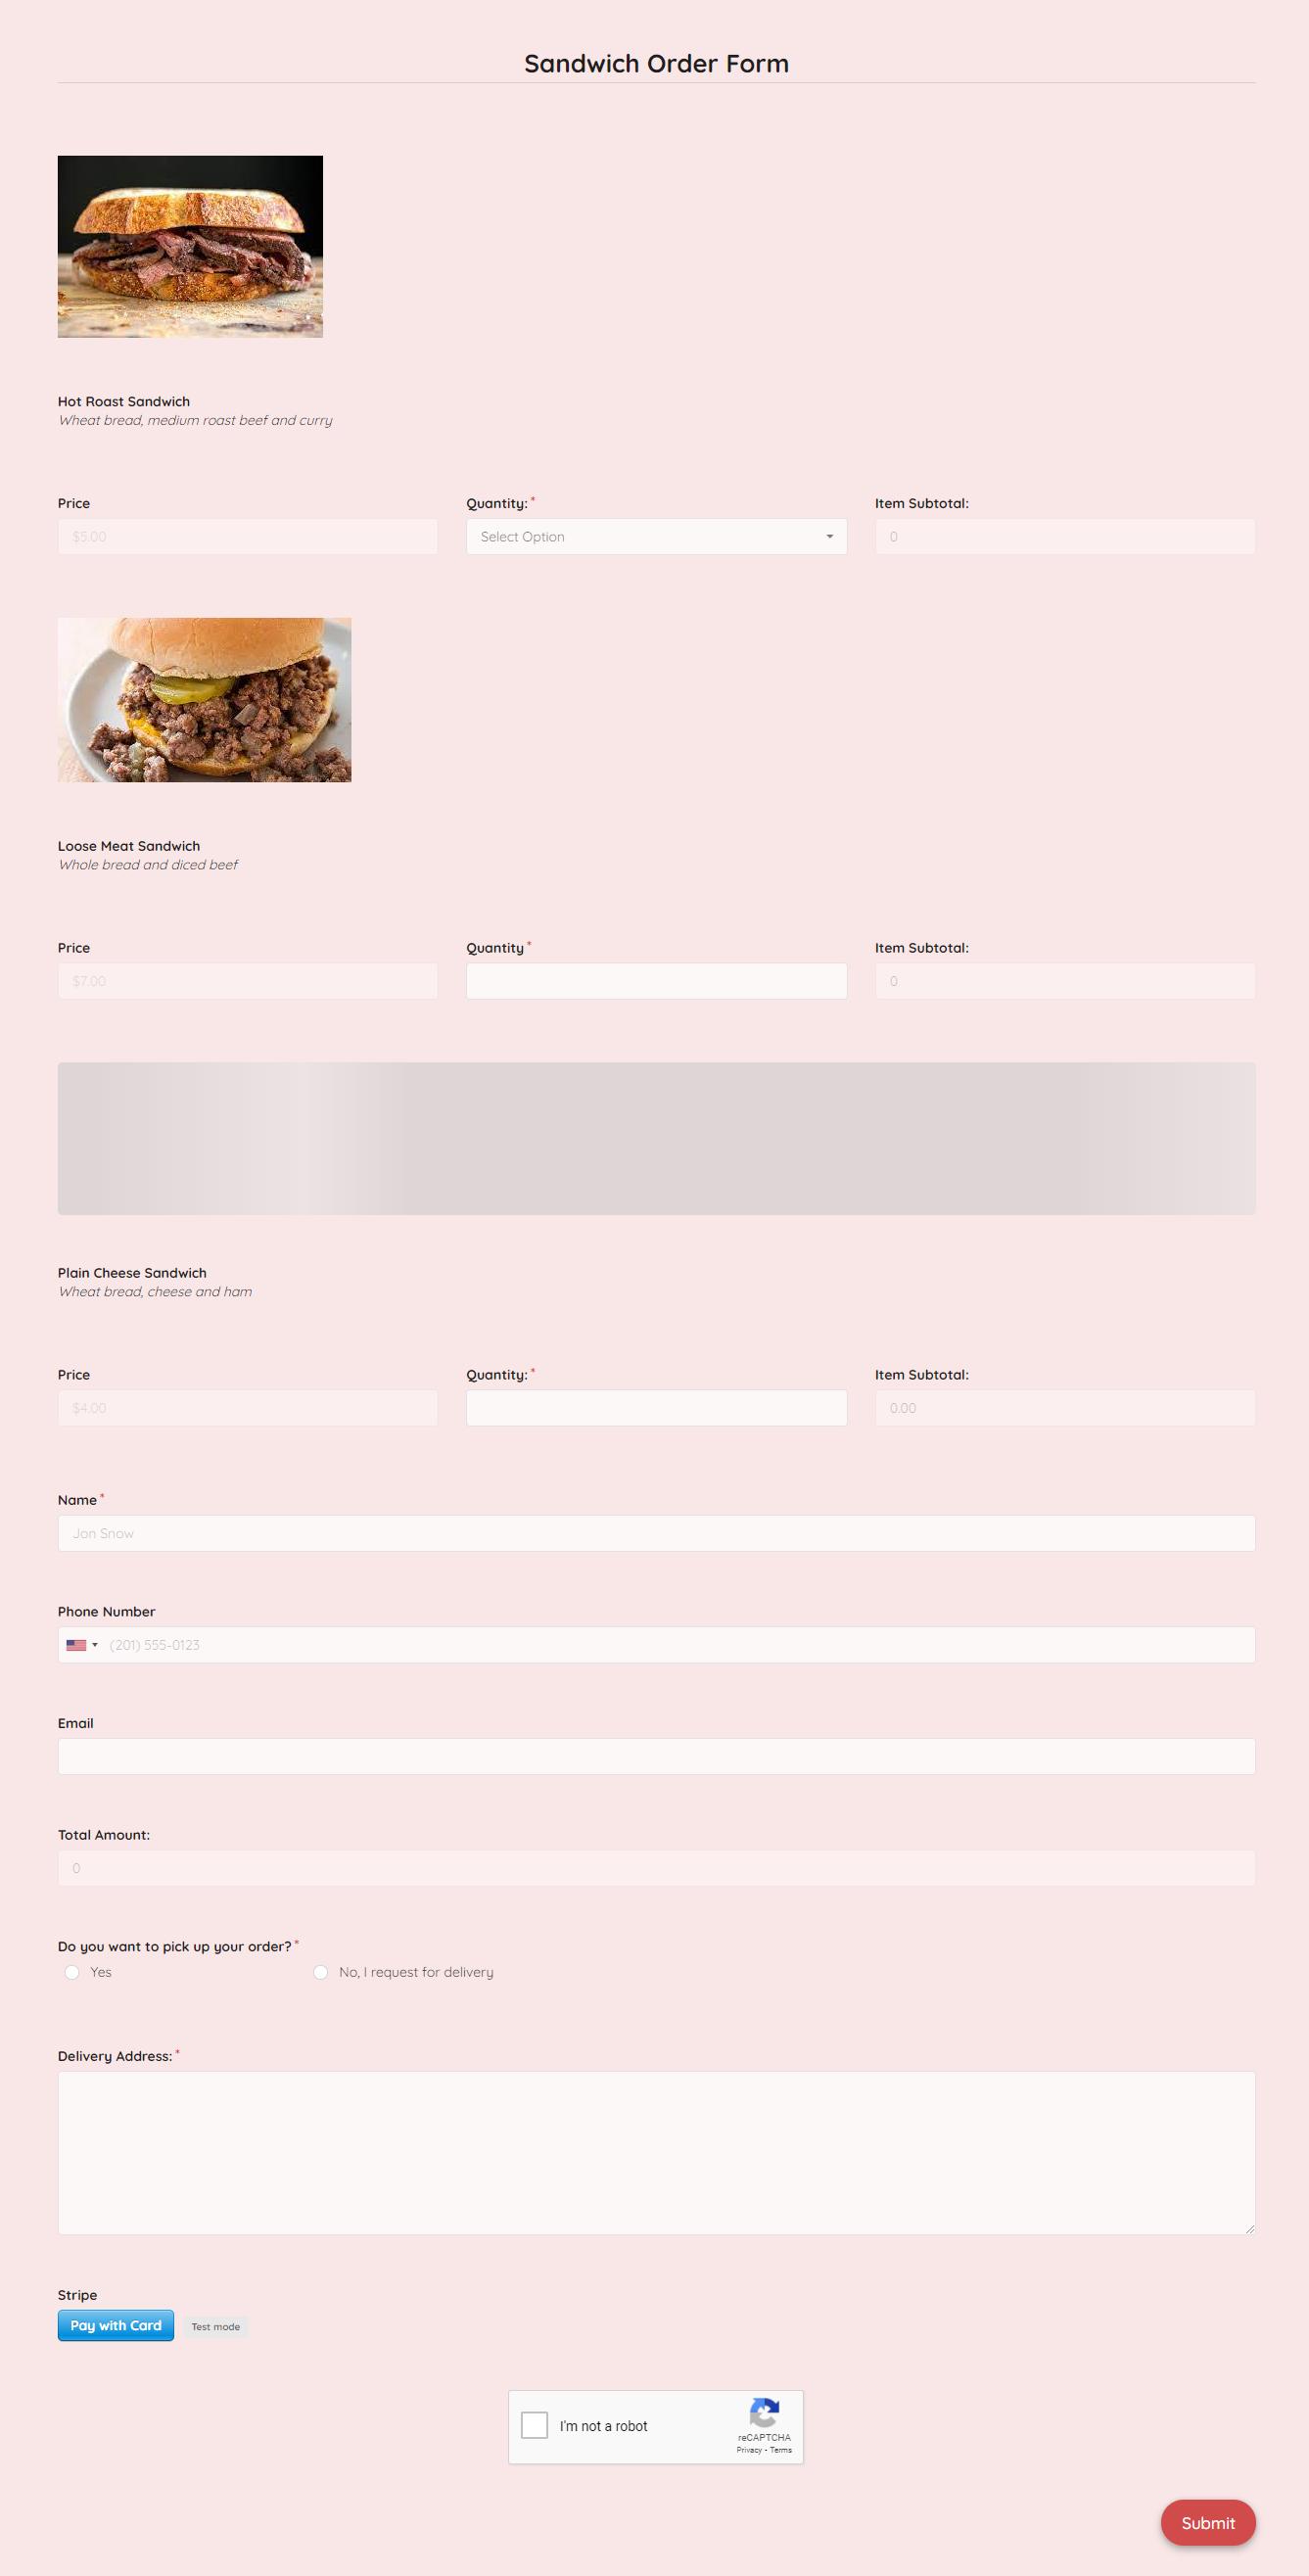 Sandwich Order Form Template template